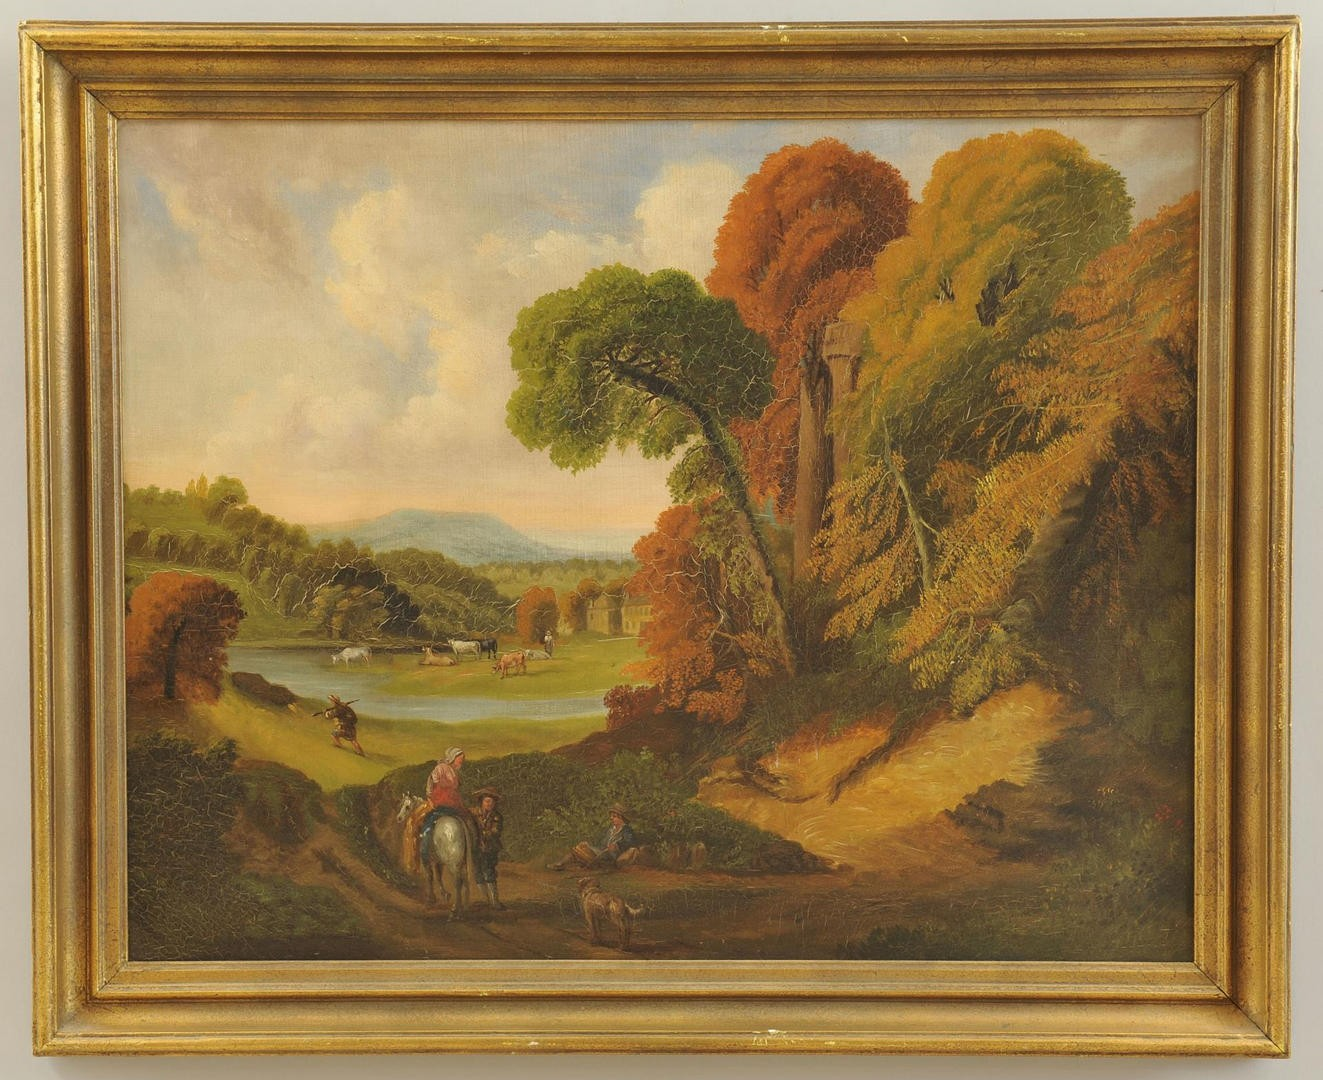 Lot 545: 19th Century Continental Landscape Oil